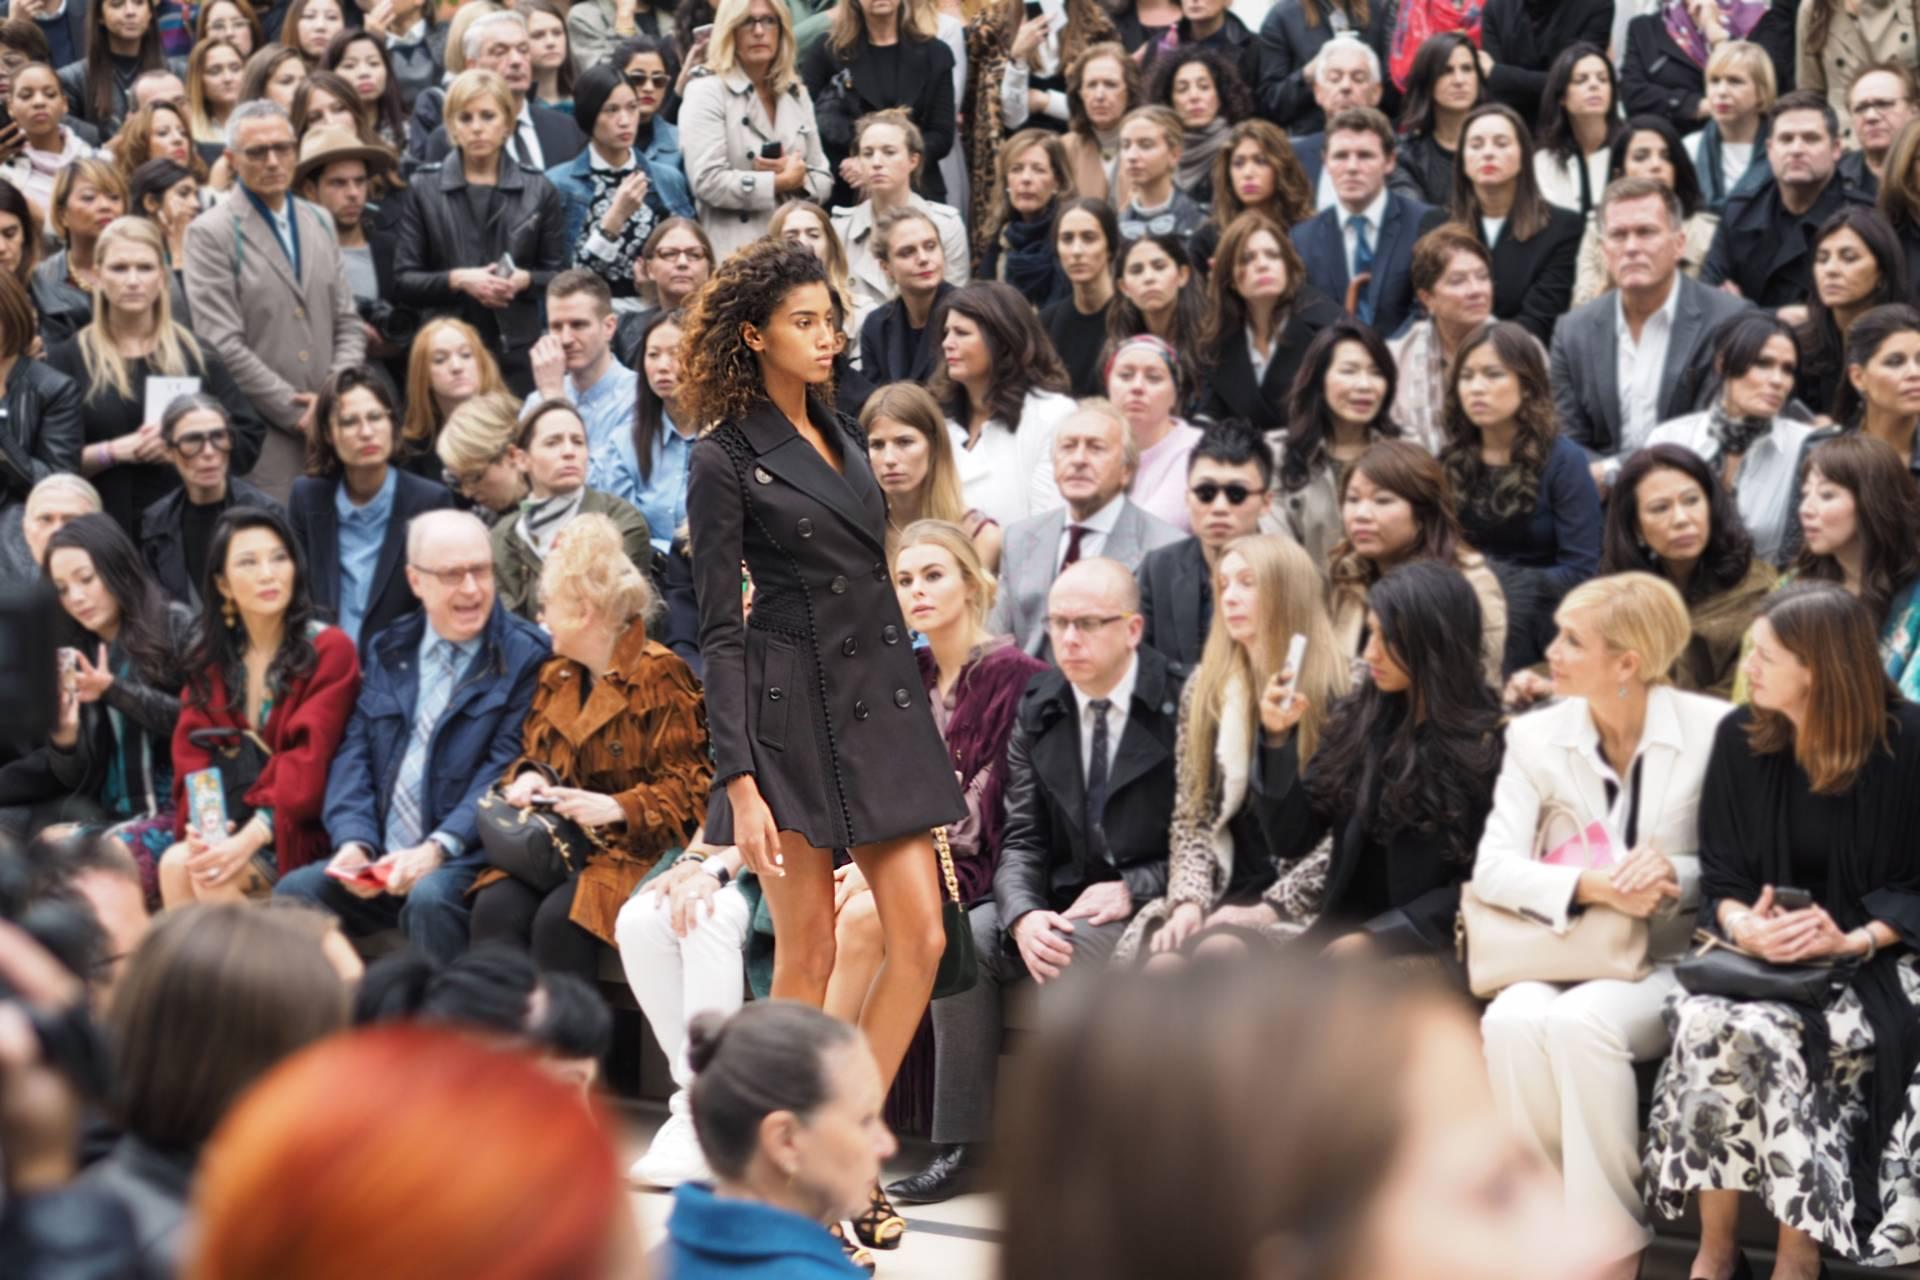 Burberry Spring/Summer 2016 London Fashion Week Runway inthefrow.com Imaan